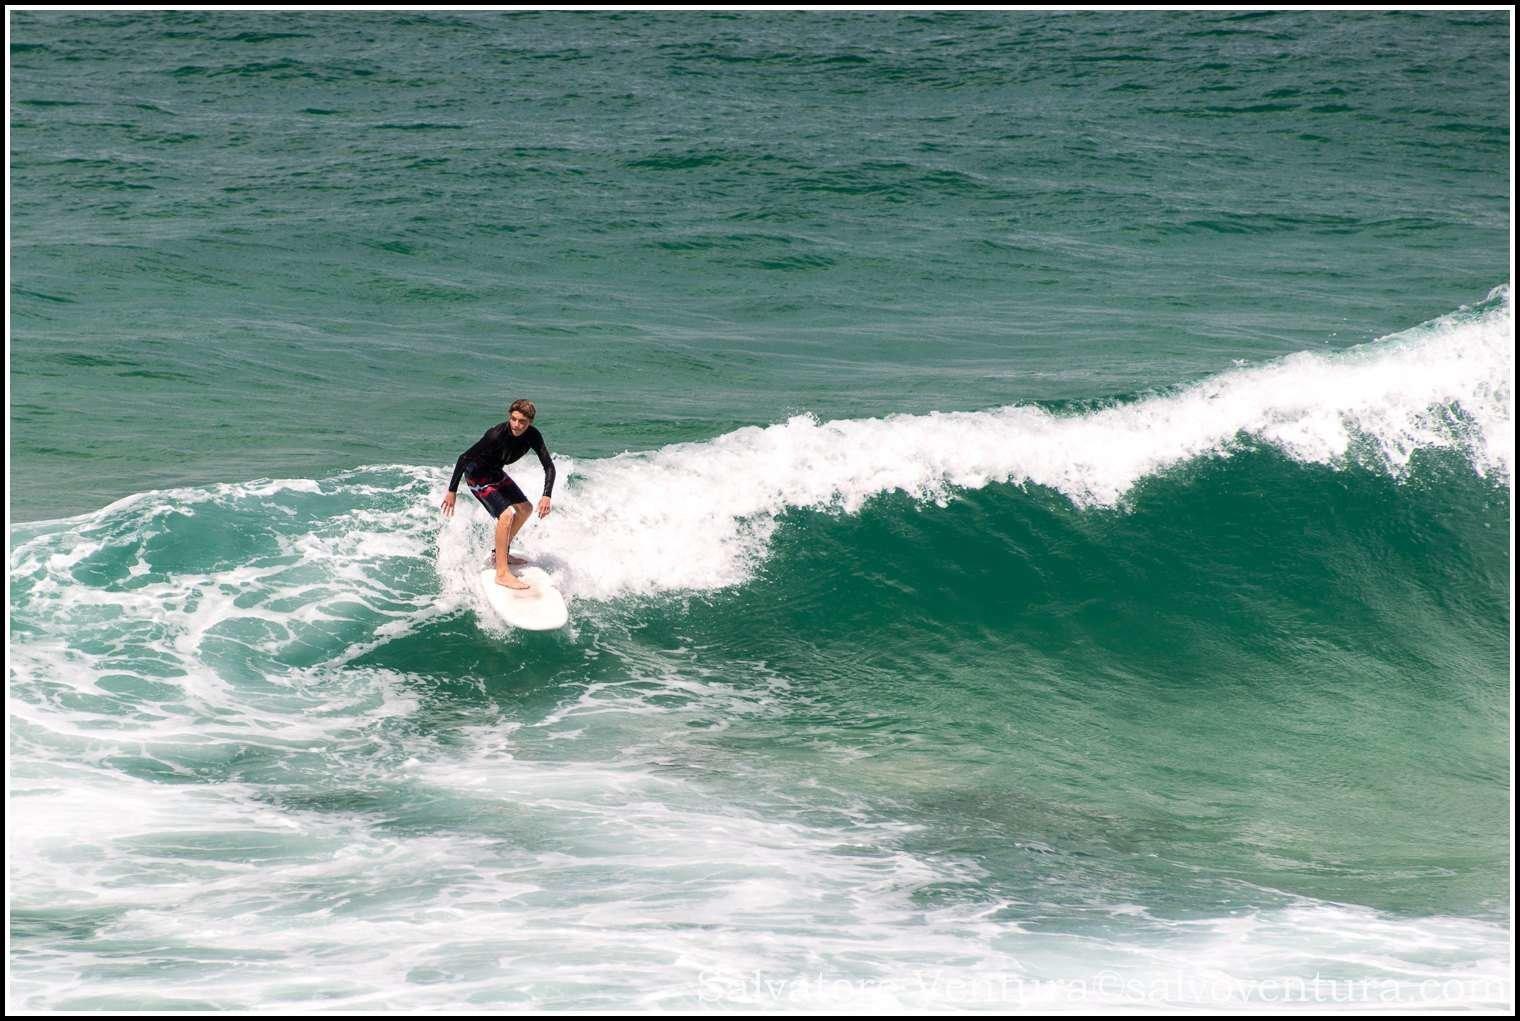 2016.03.05 Sydney Bondi to Coogee coastal hike-salvoventura-blog-DSC_6832